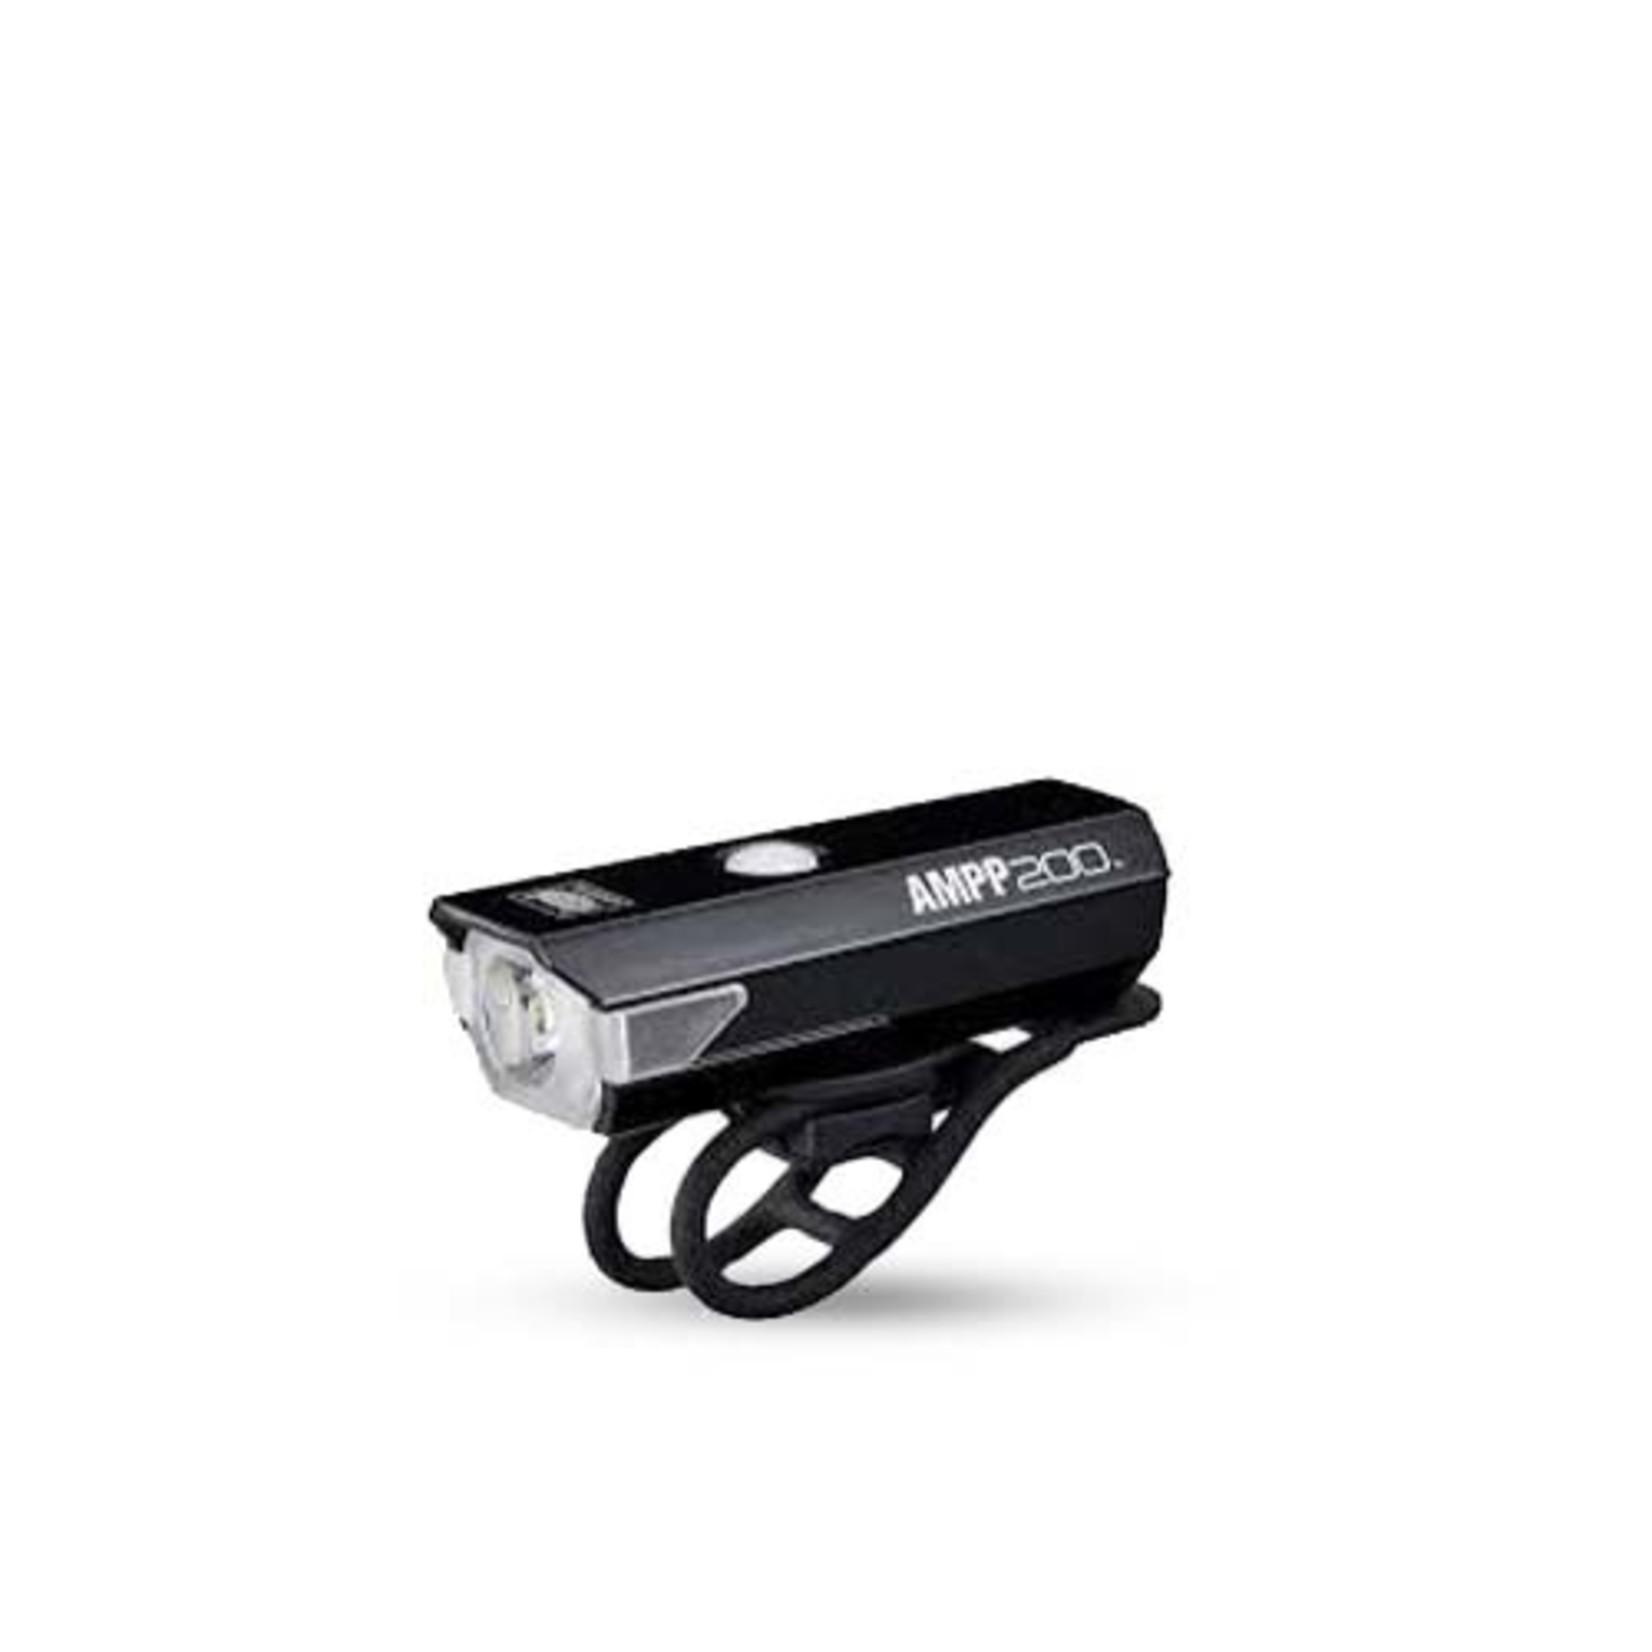 CATEYE AMPP 200 / VIZ 100 LIGHT SET